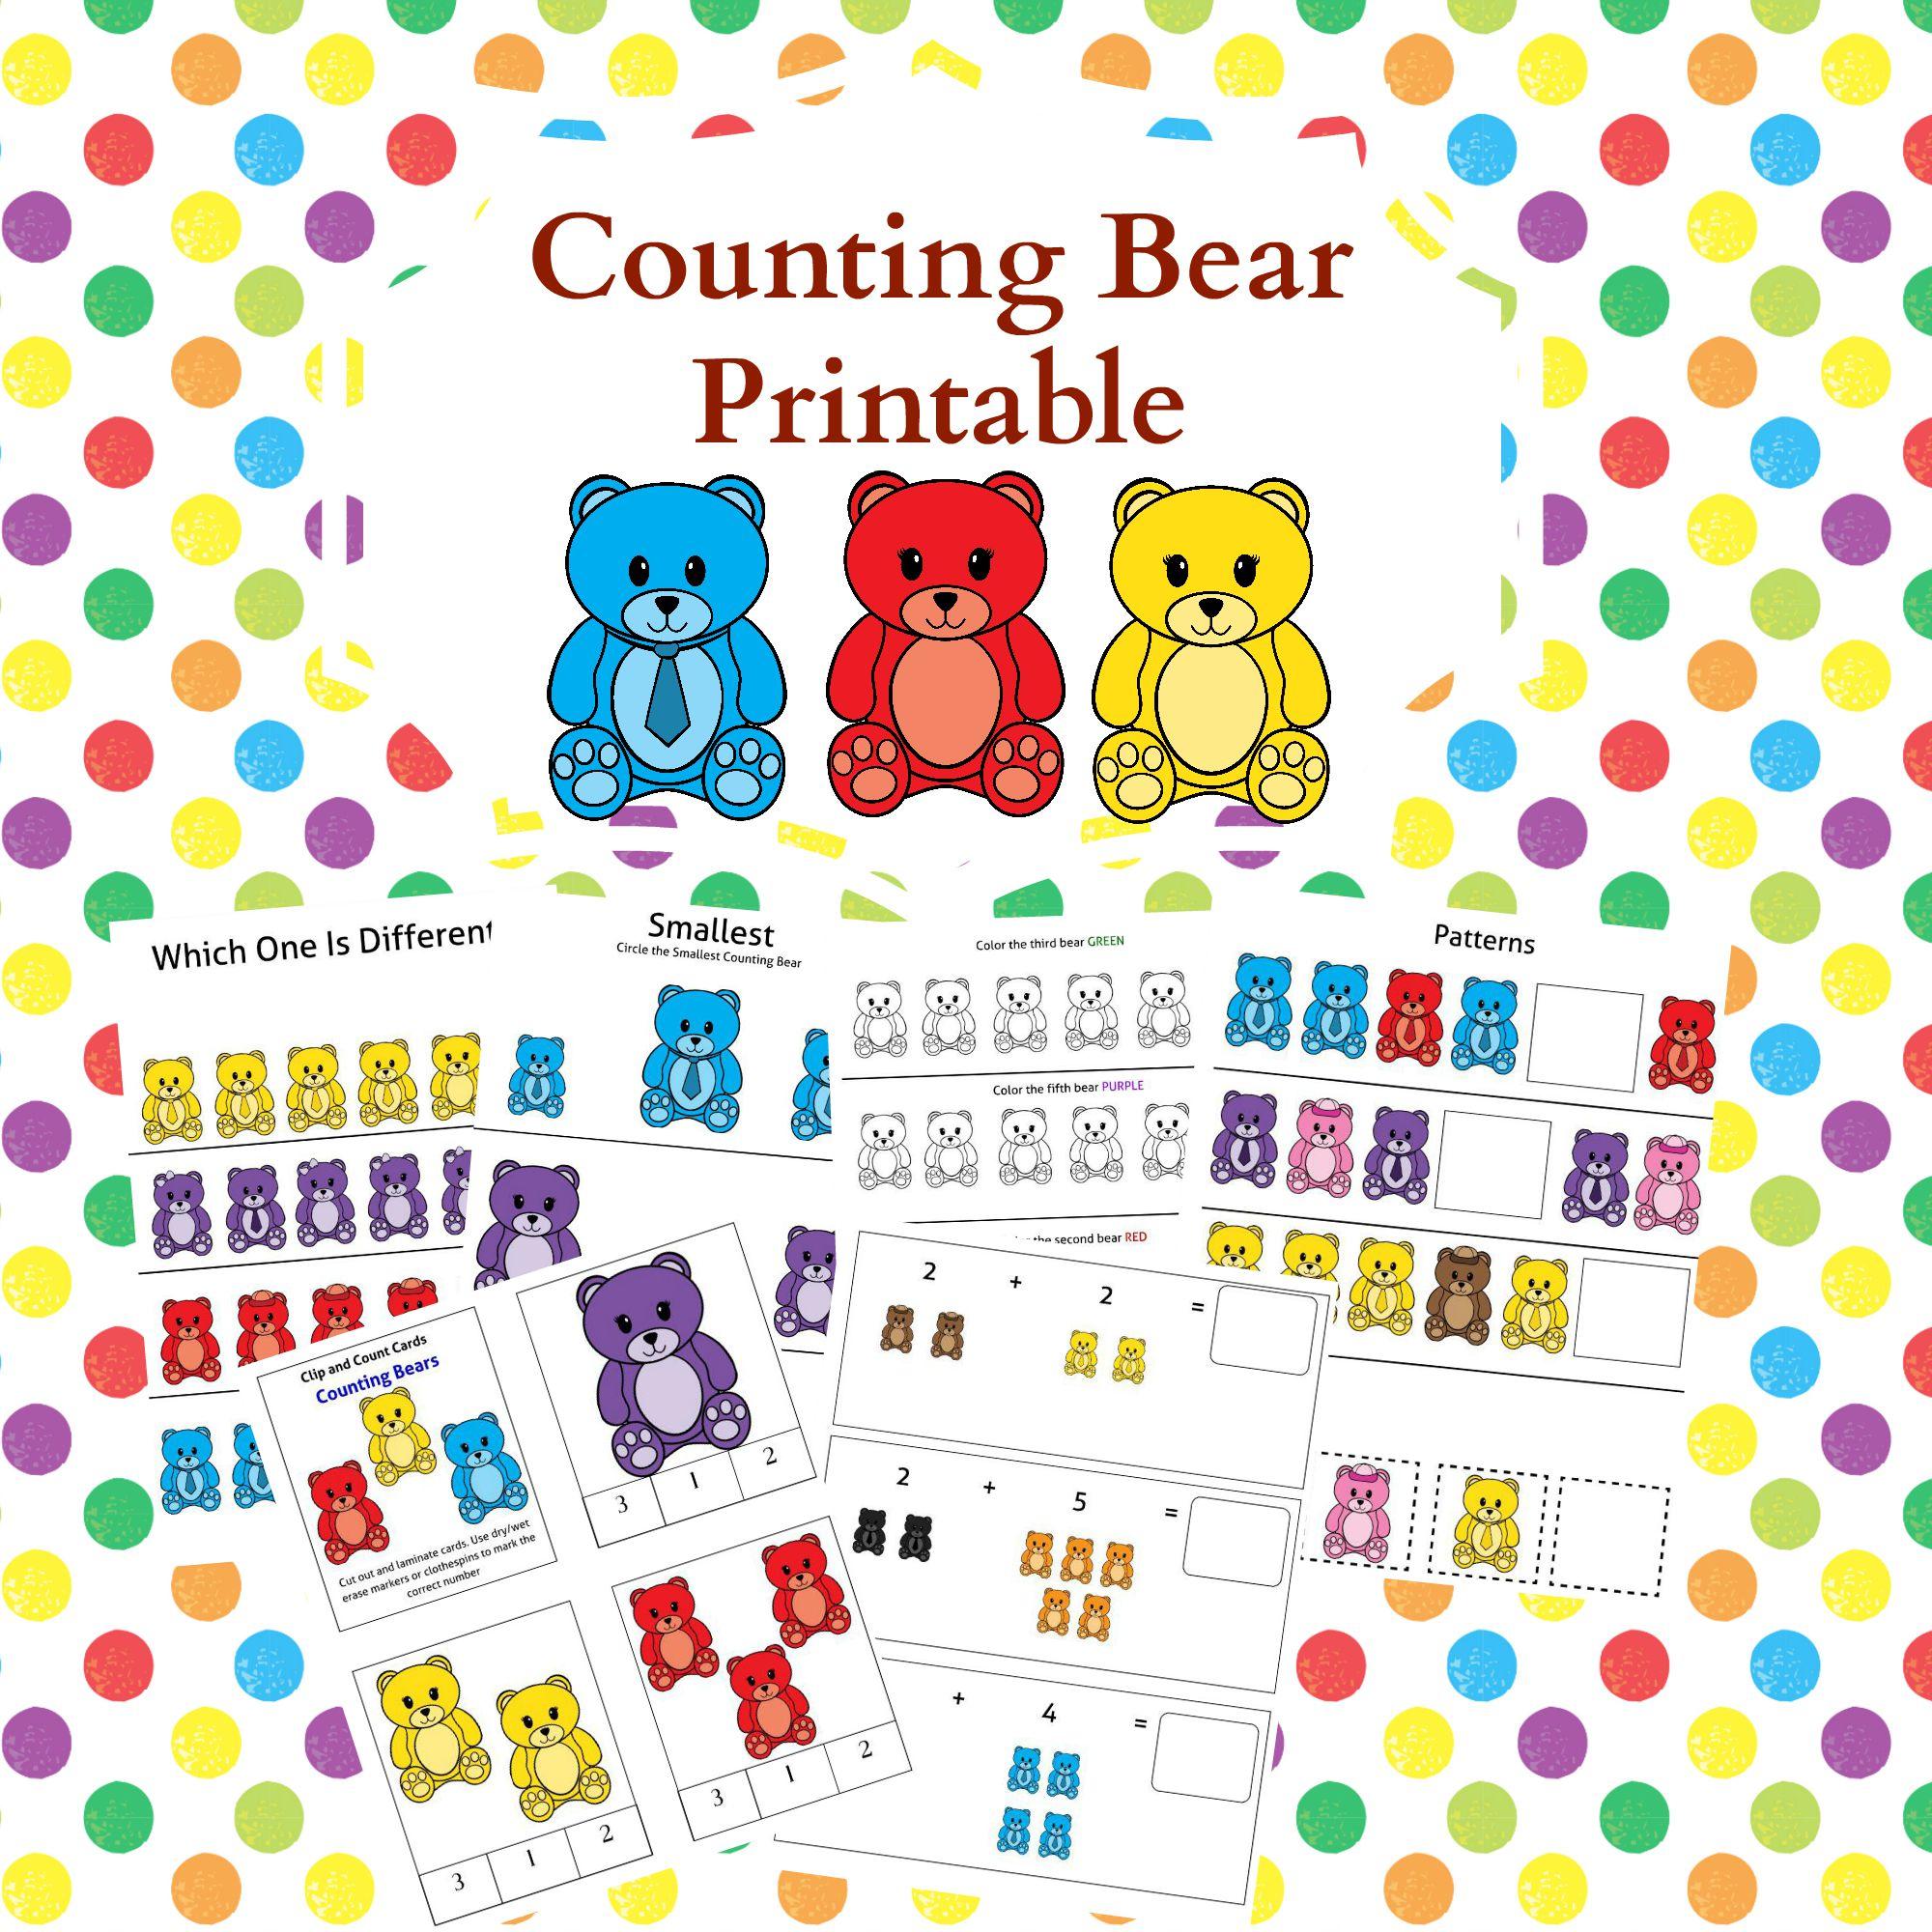 photo regarding Printable Bears Schedule named Counting Bears Printable